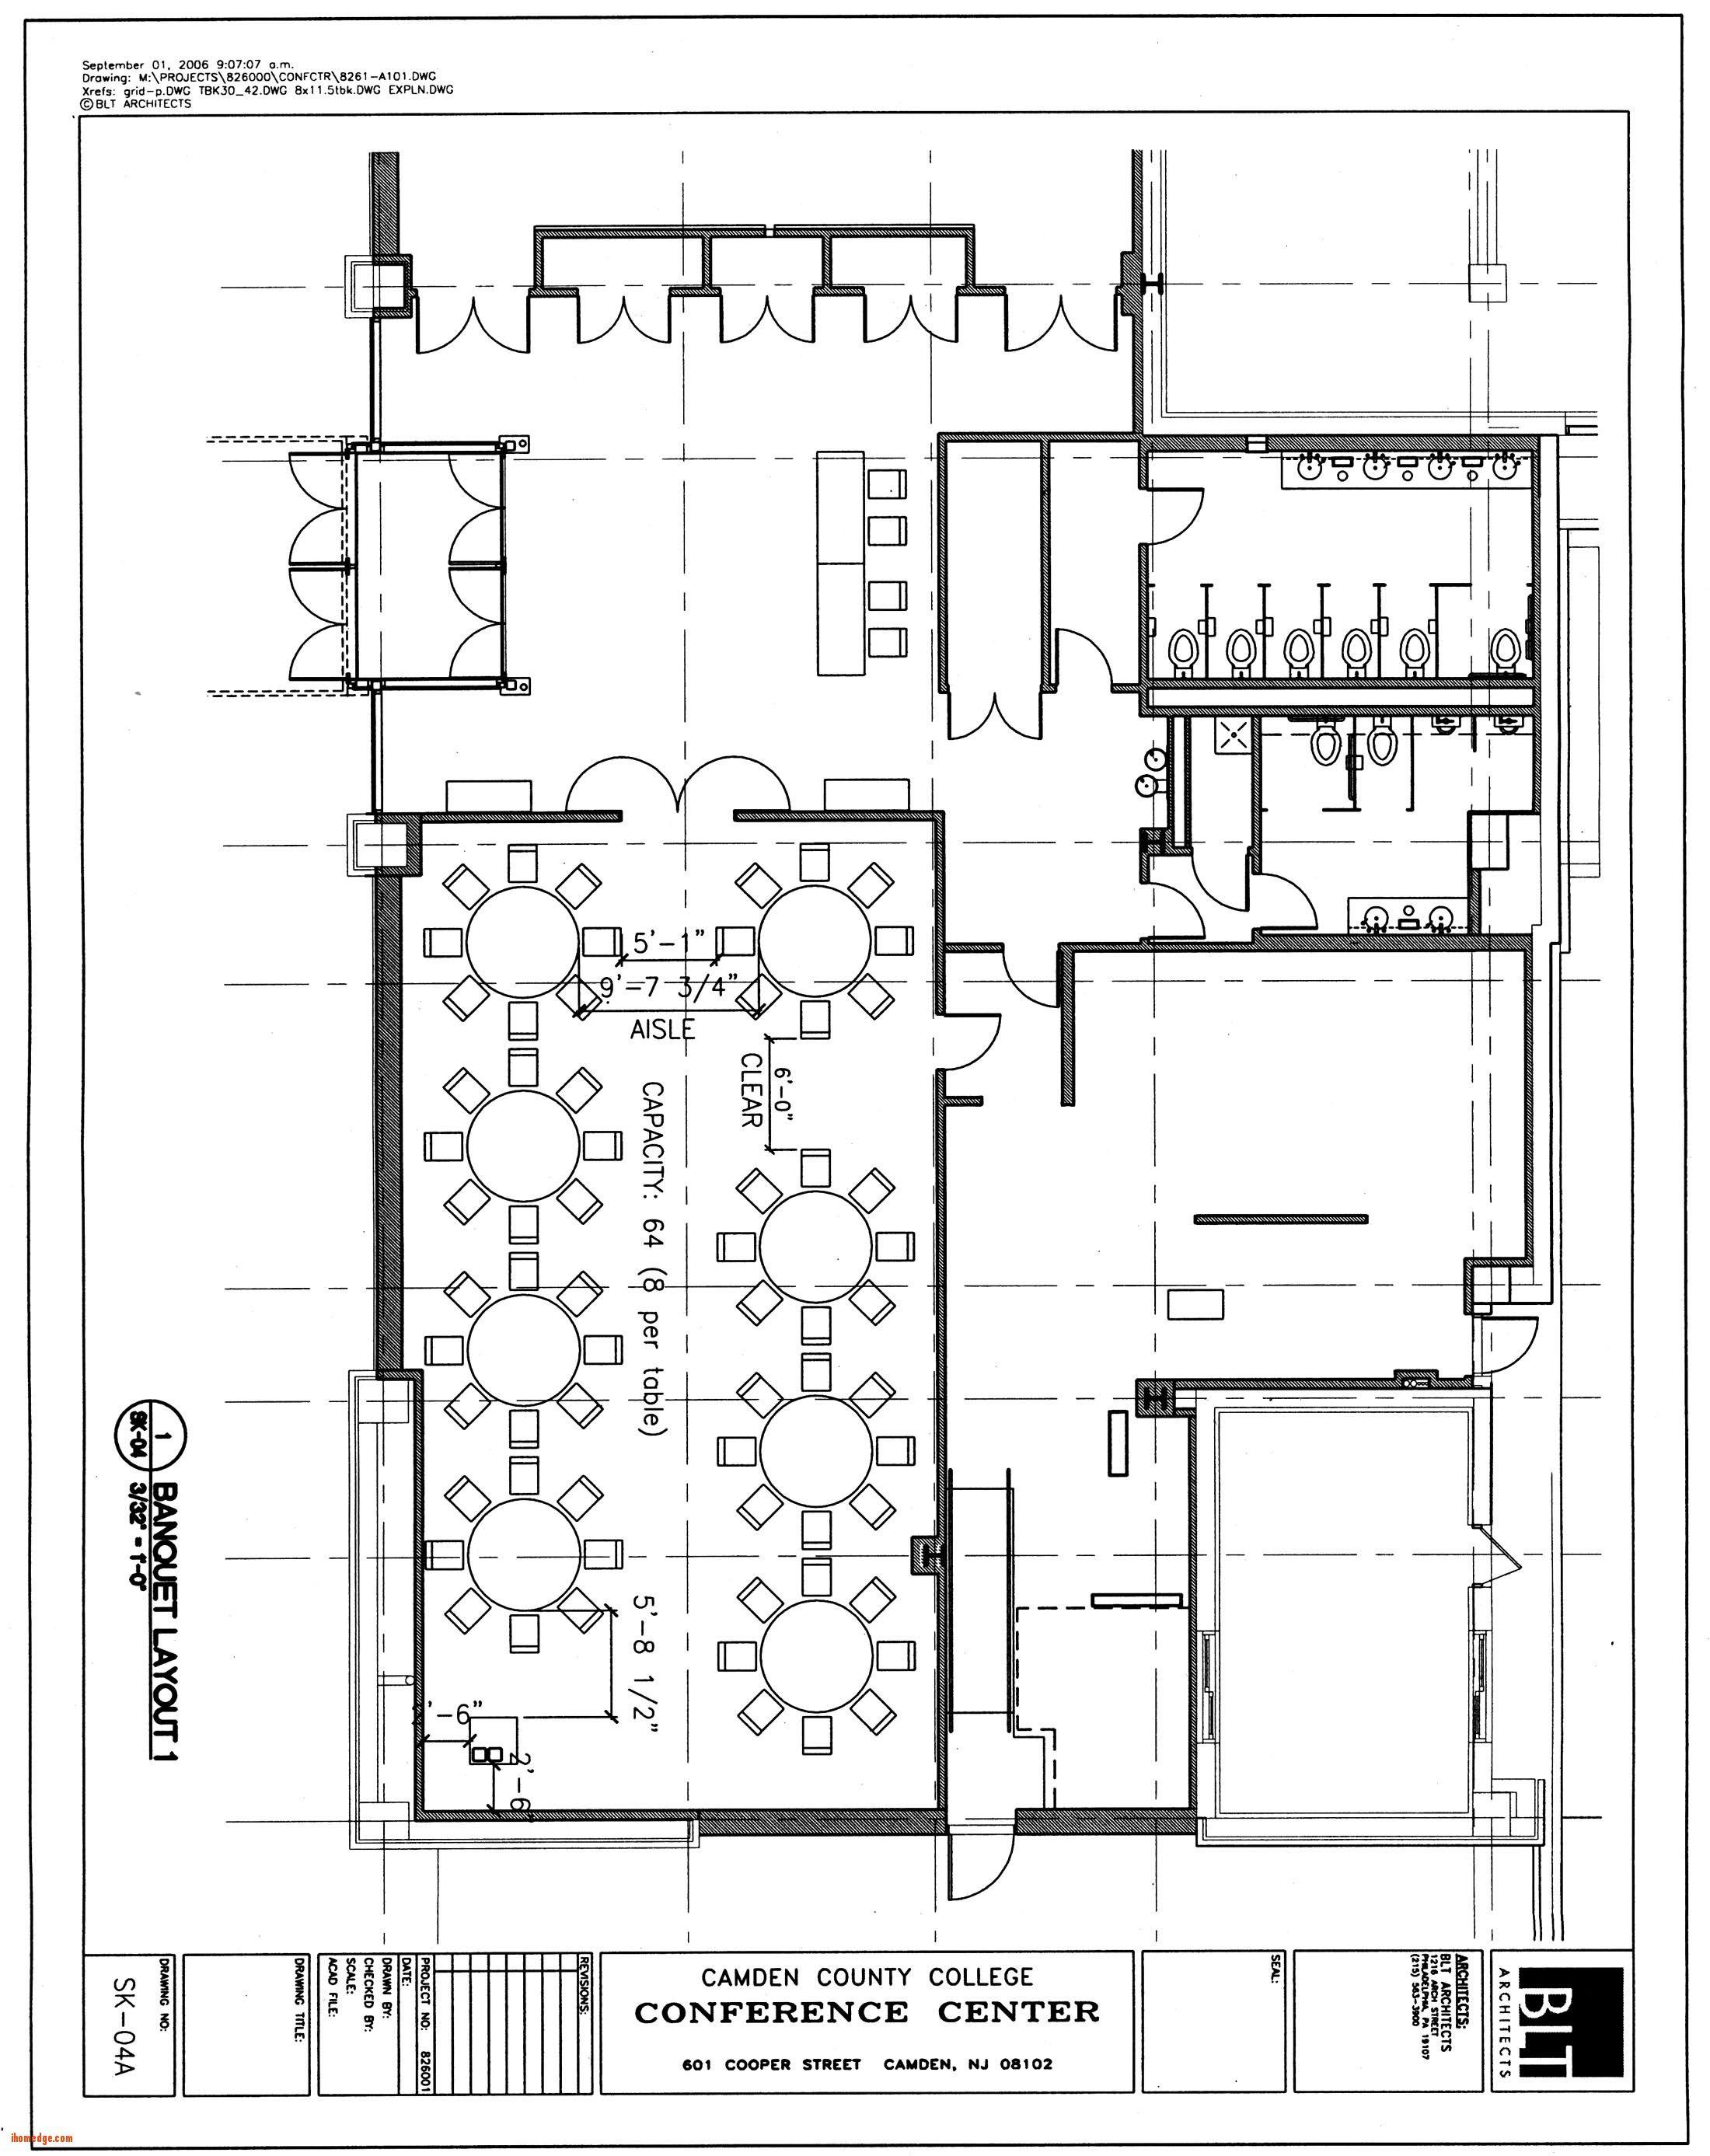 small resolution of best new kitchen design layout pretty restaurant kitchen layout 3d renovation ideas amazing minecraft layouts